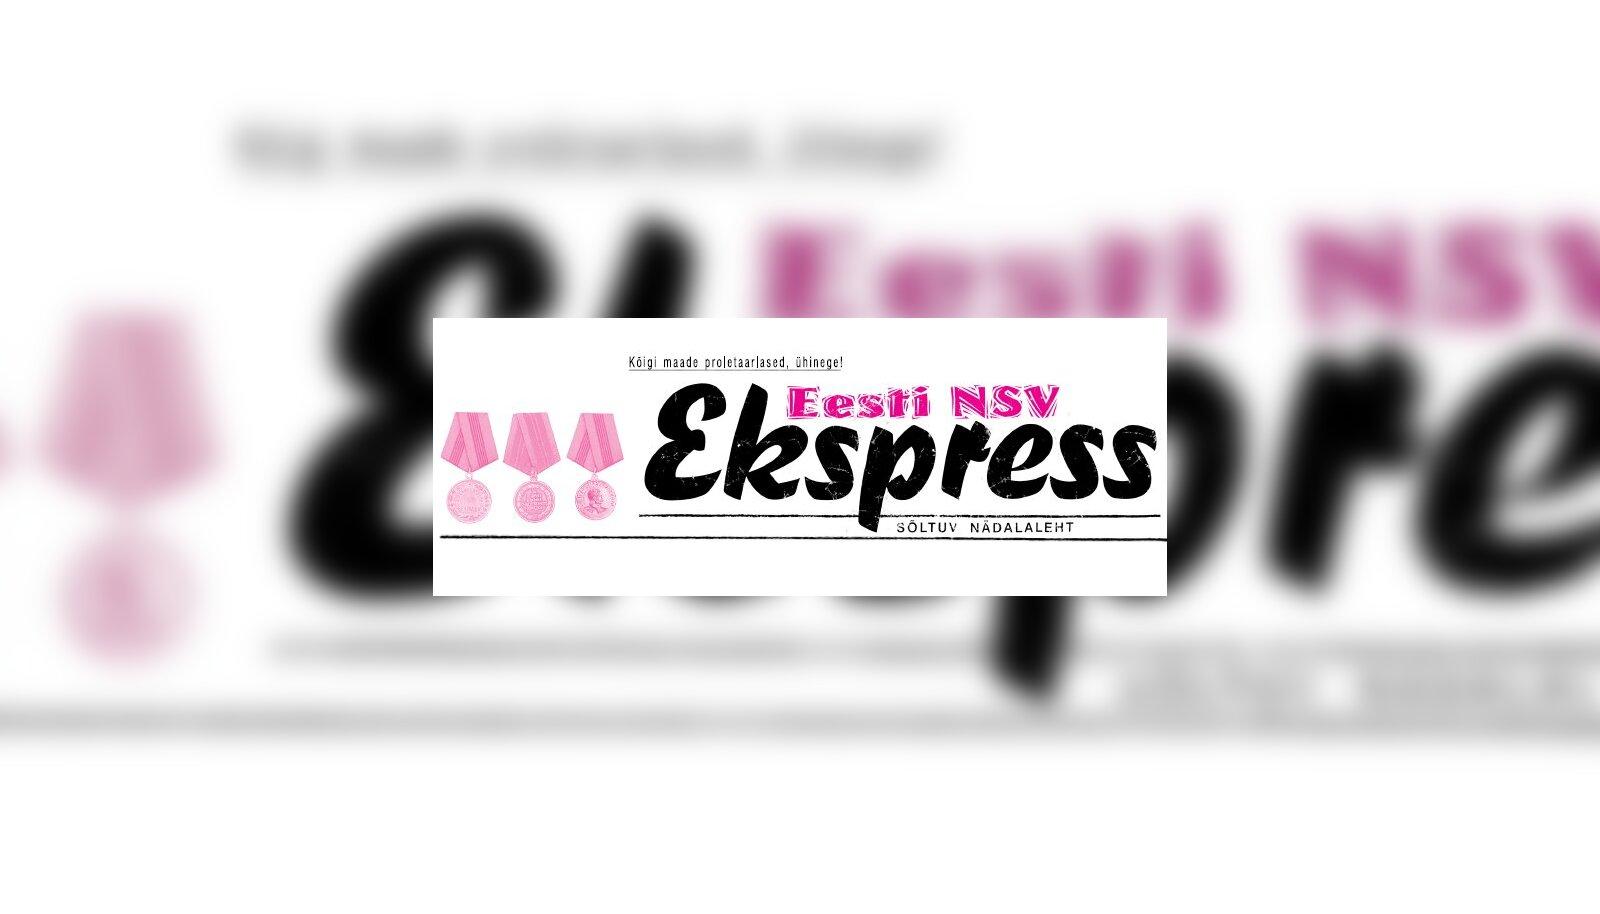 b72a4c2b974 VANA KULD: Eesti NSV Ekspress